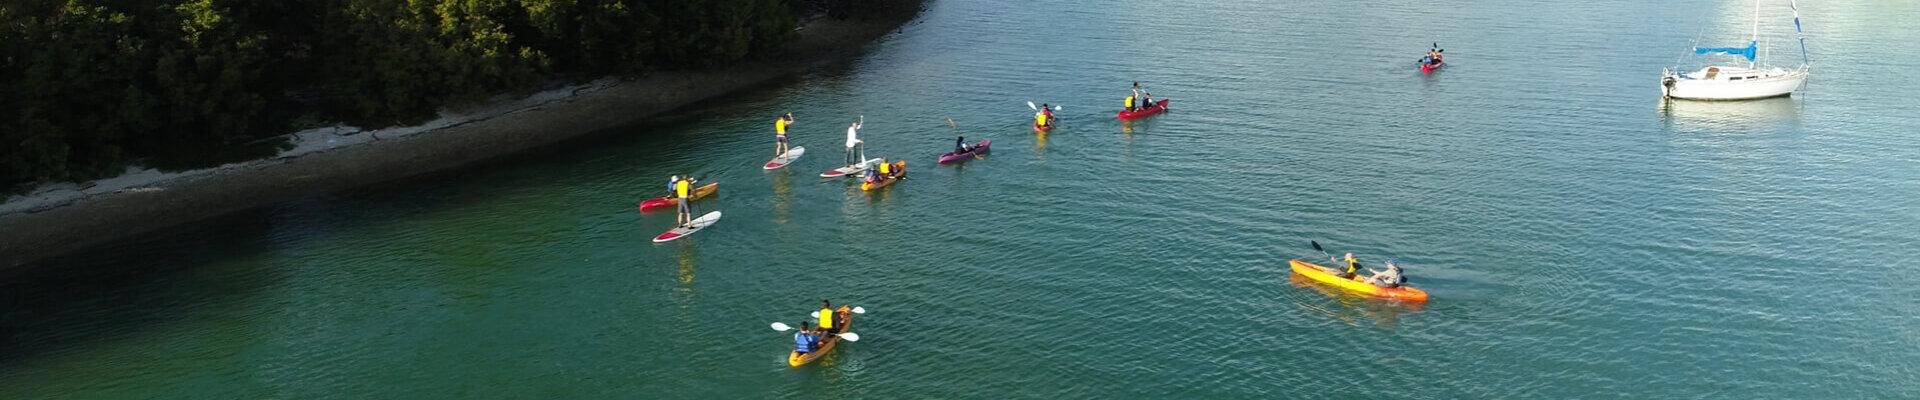 Miami Beach Paddleboard Kayak Rental